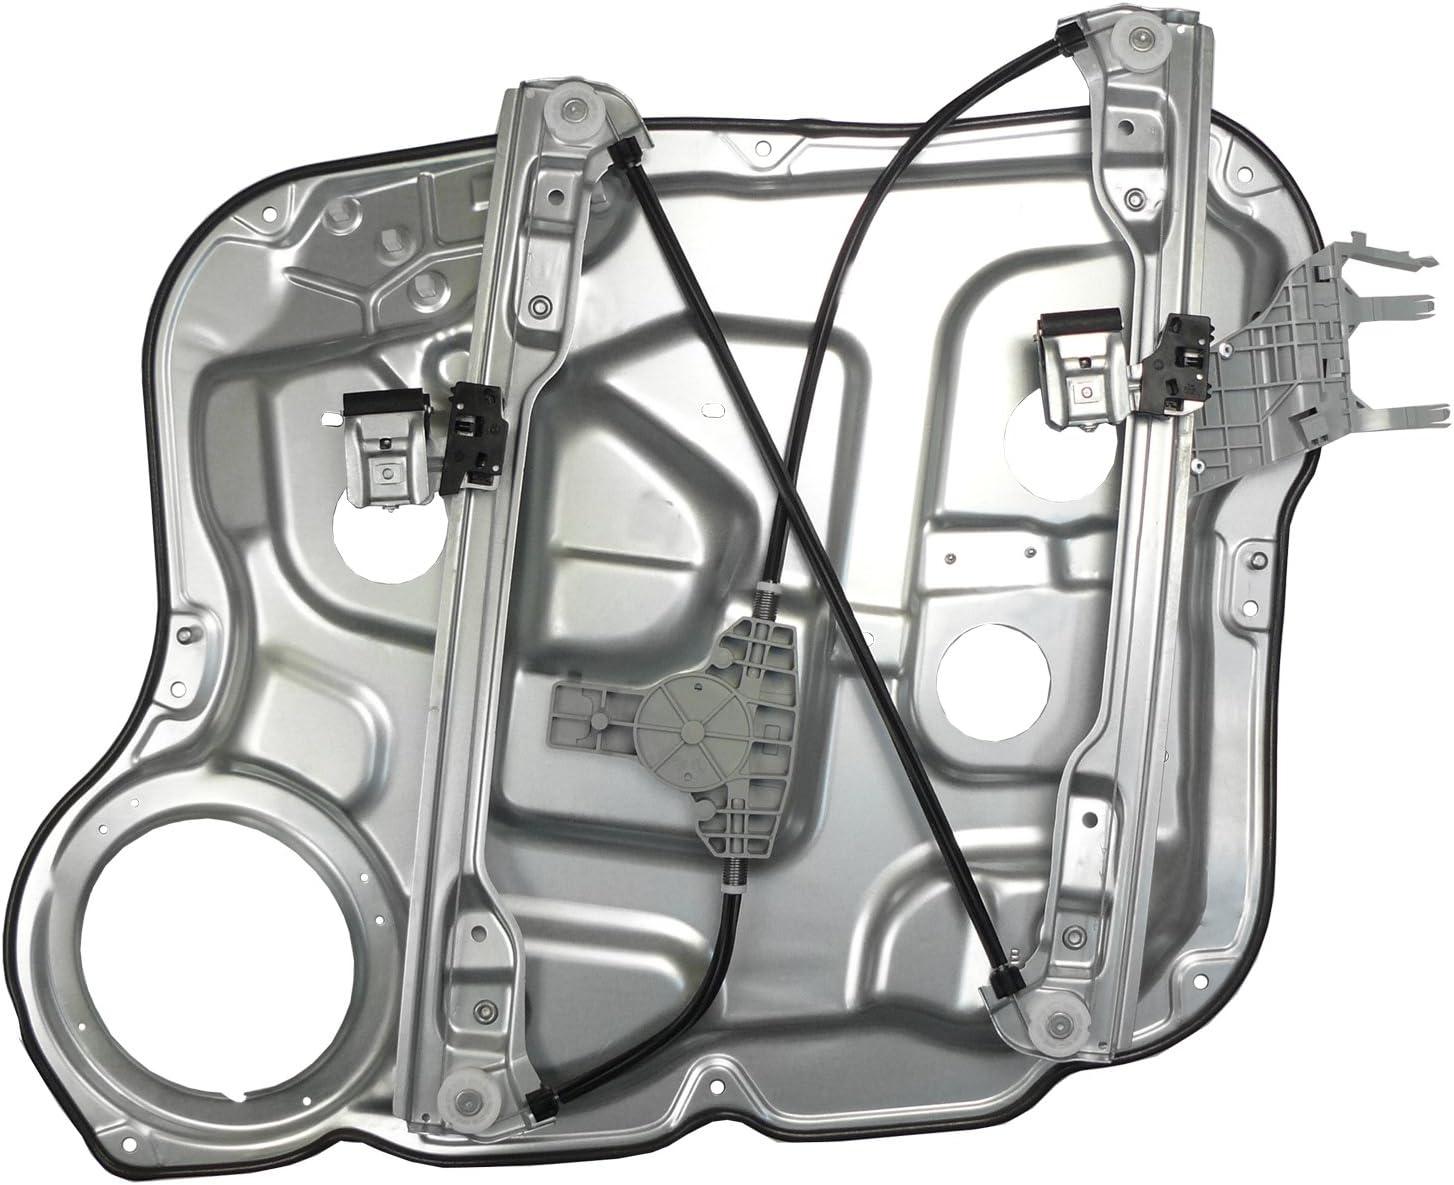 Replacement Parts Automotive poslinemb.pl ACI 88996 Power Window ...